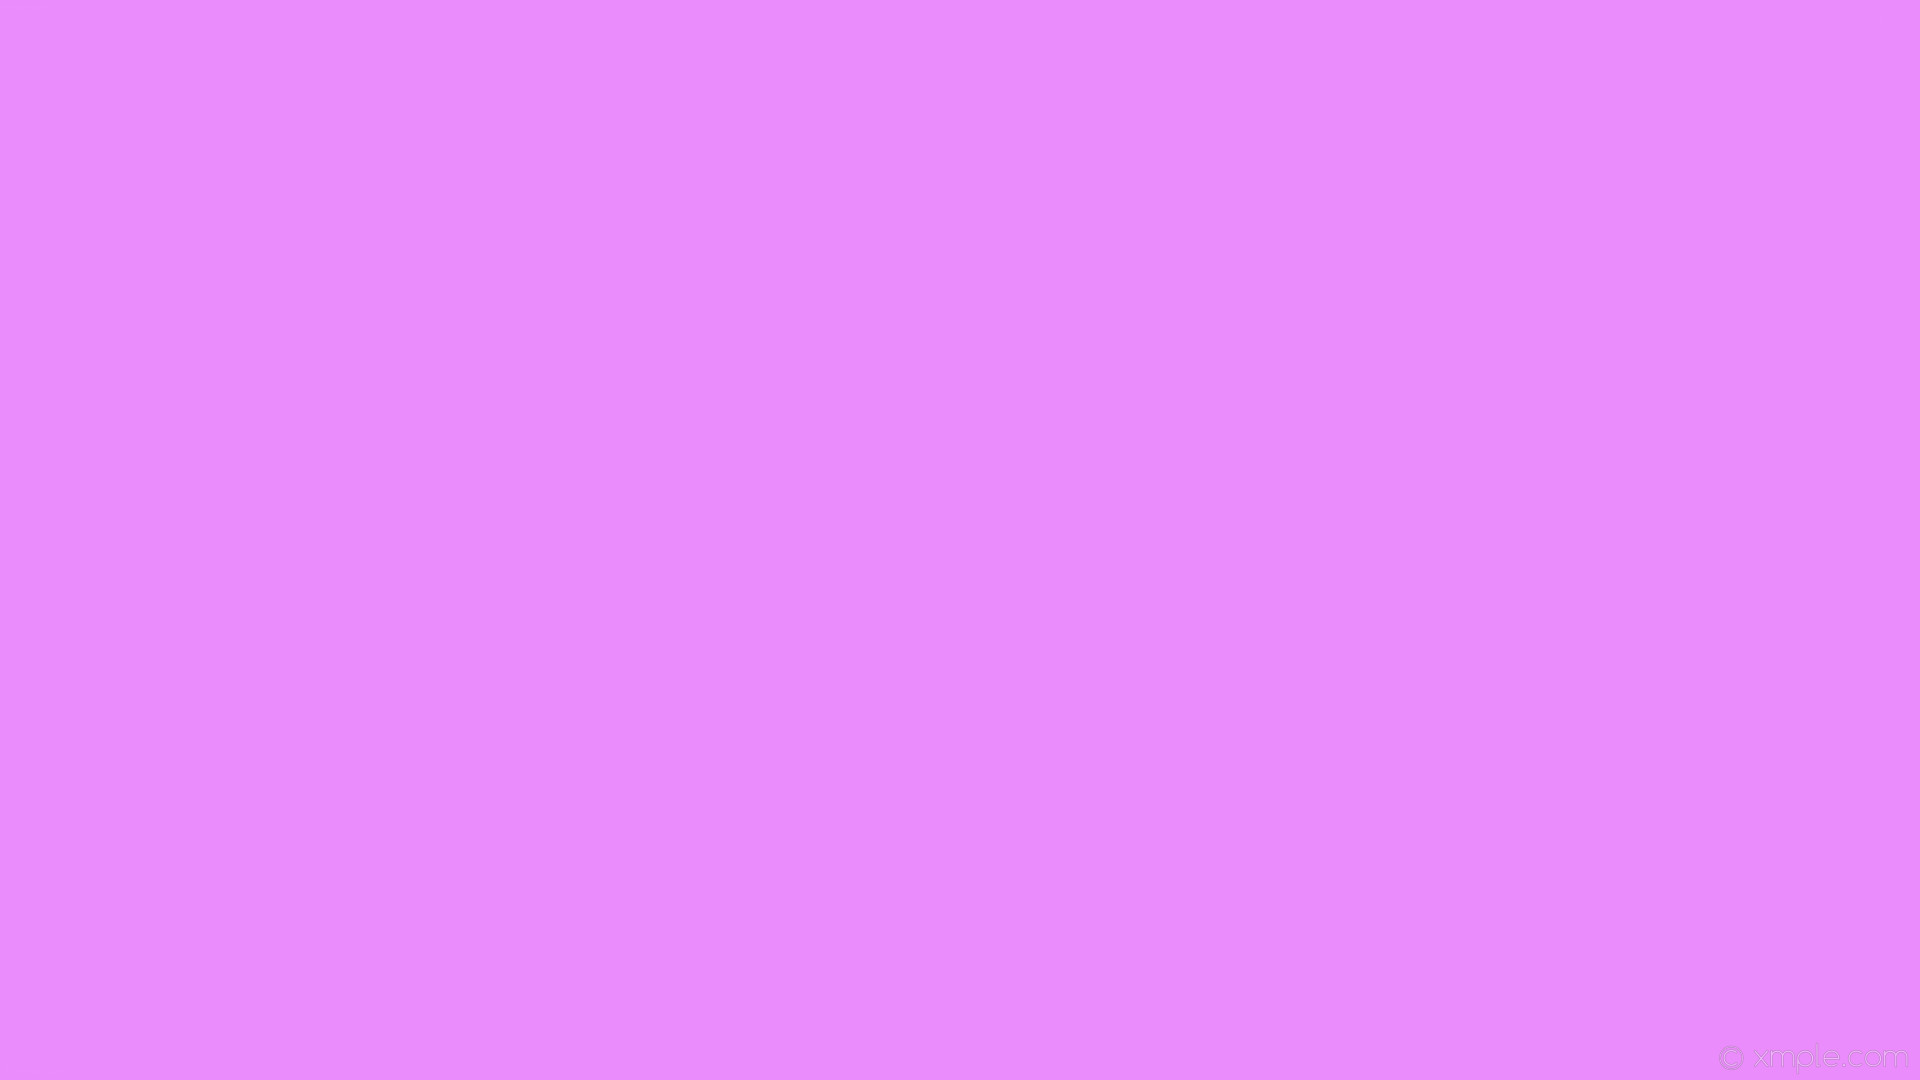 wallpaper plain one colour solid color single magenta #eb8cfc